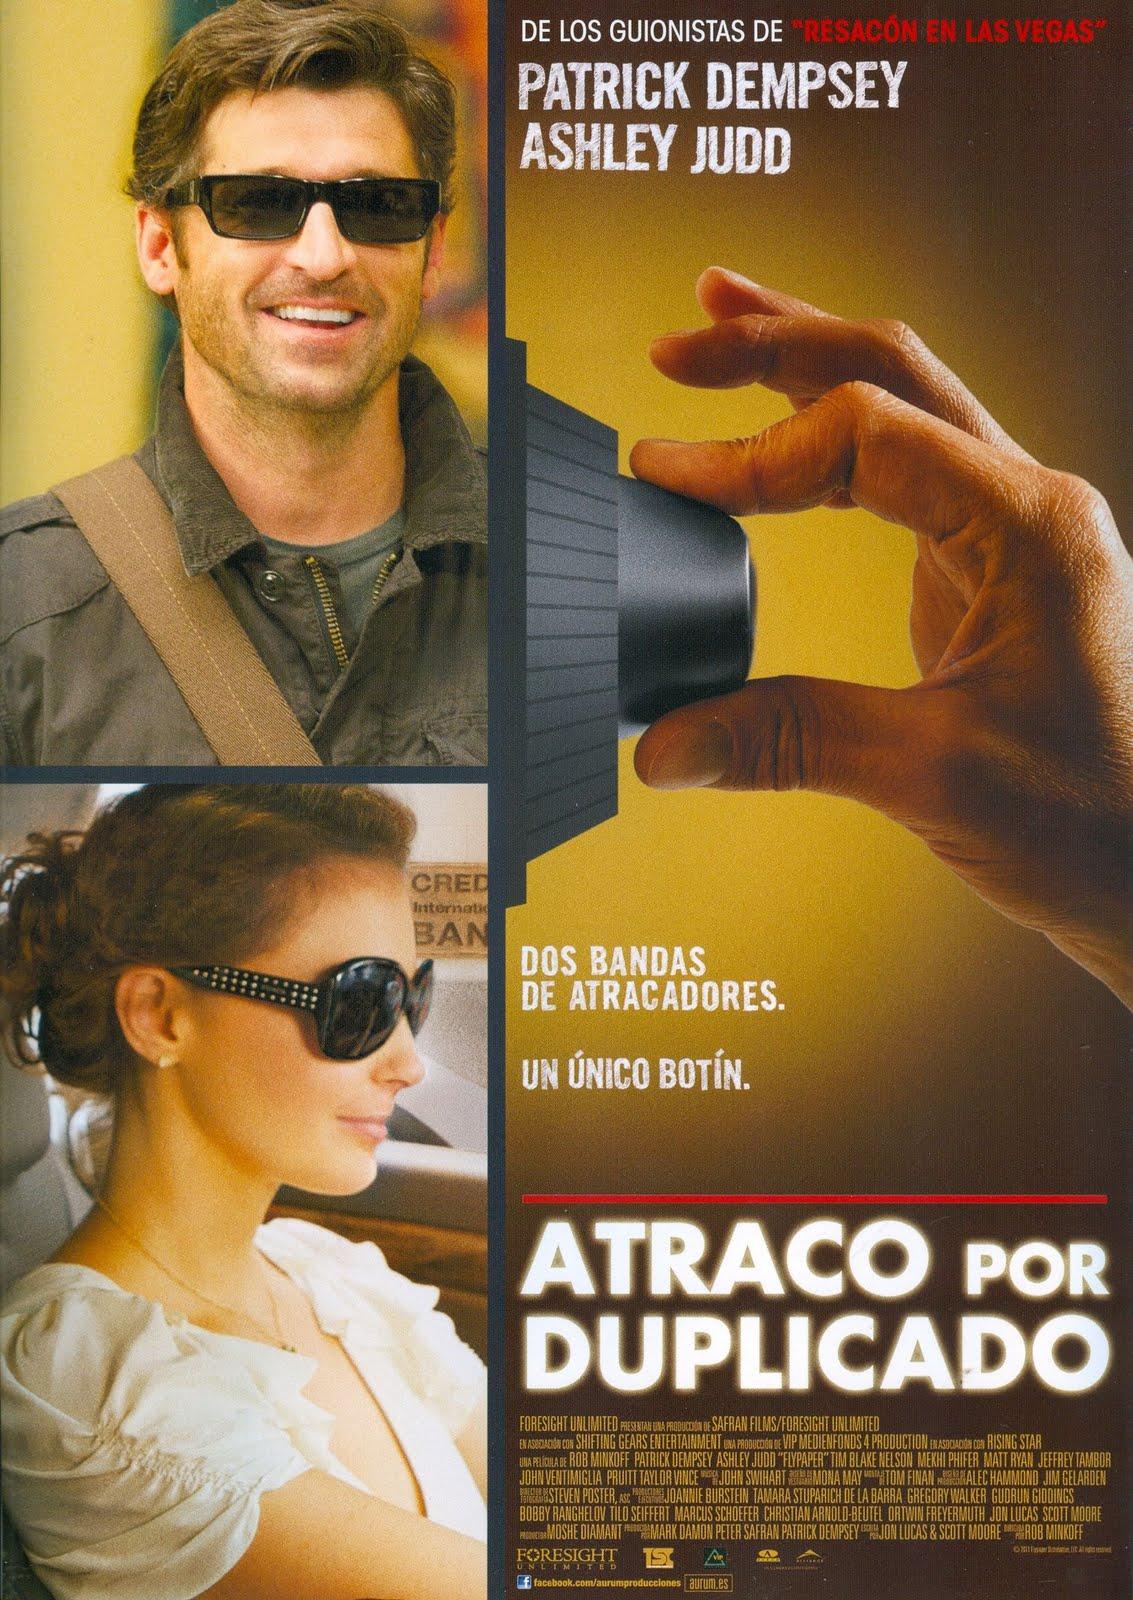 Atraco por duplicado (2011)